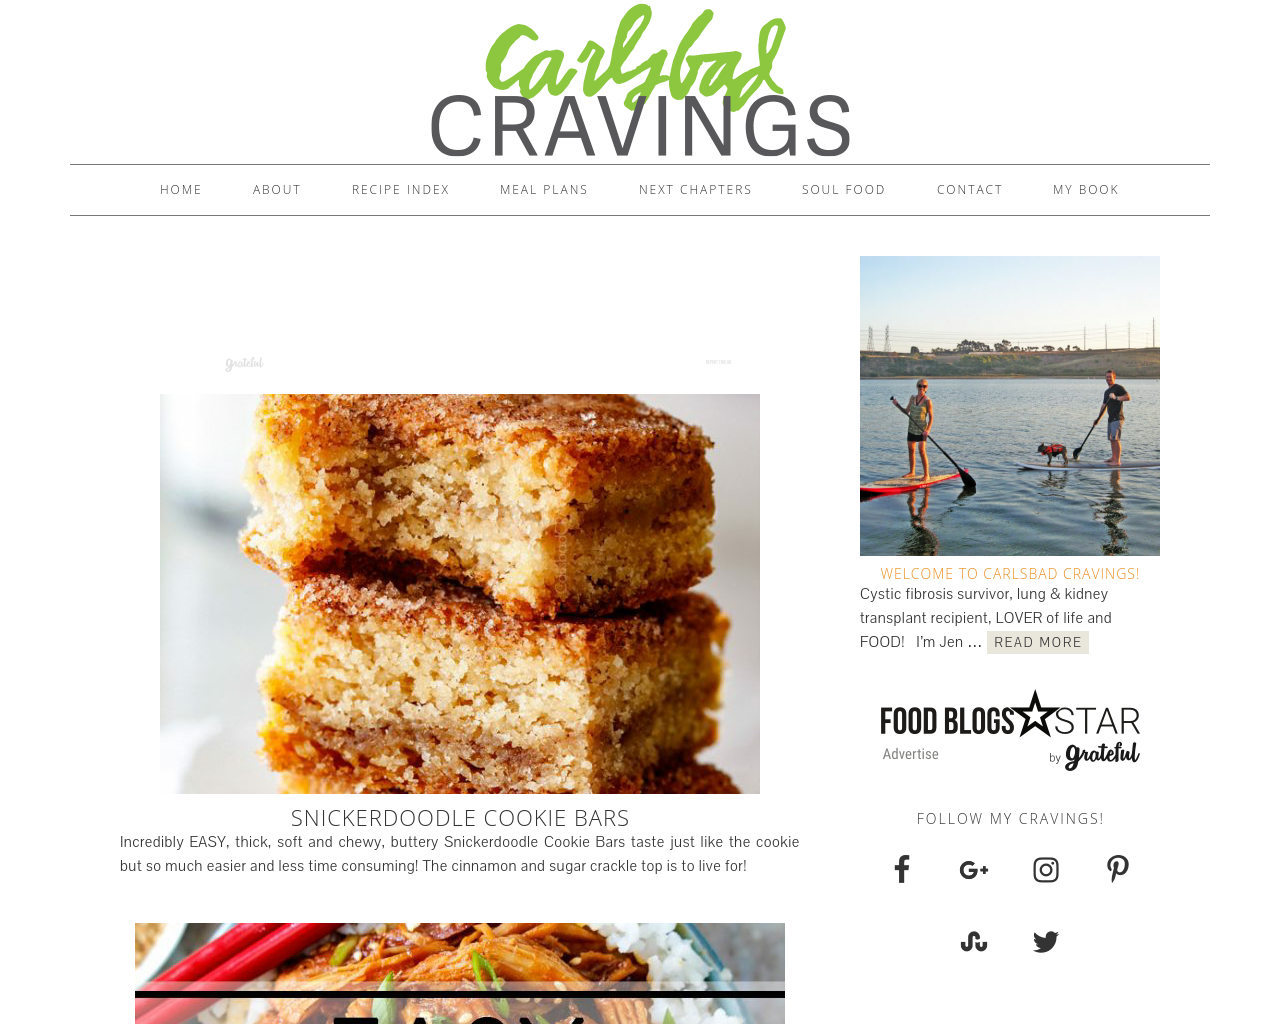 Carlsbad-Cravings-Advertising-Reviews-Pricing